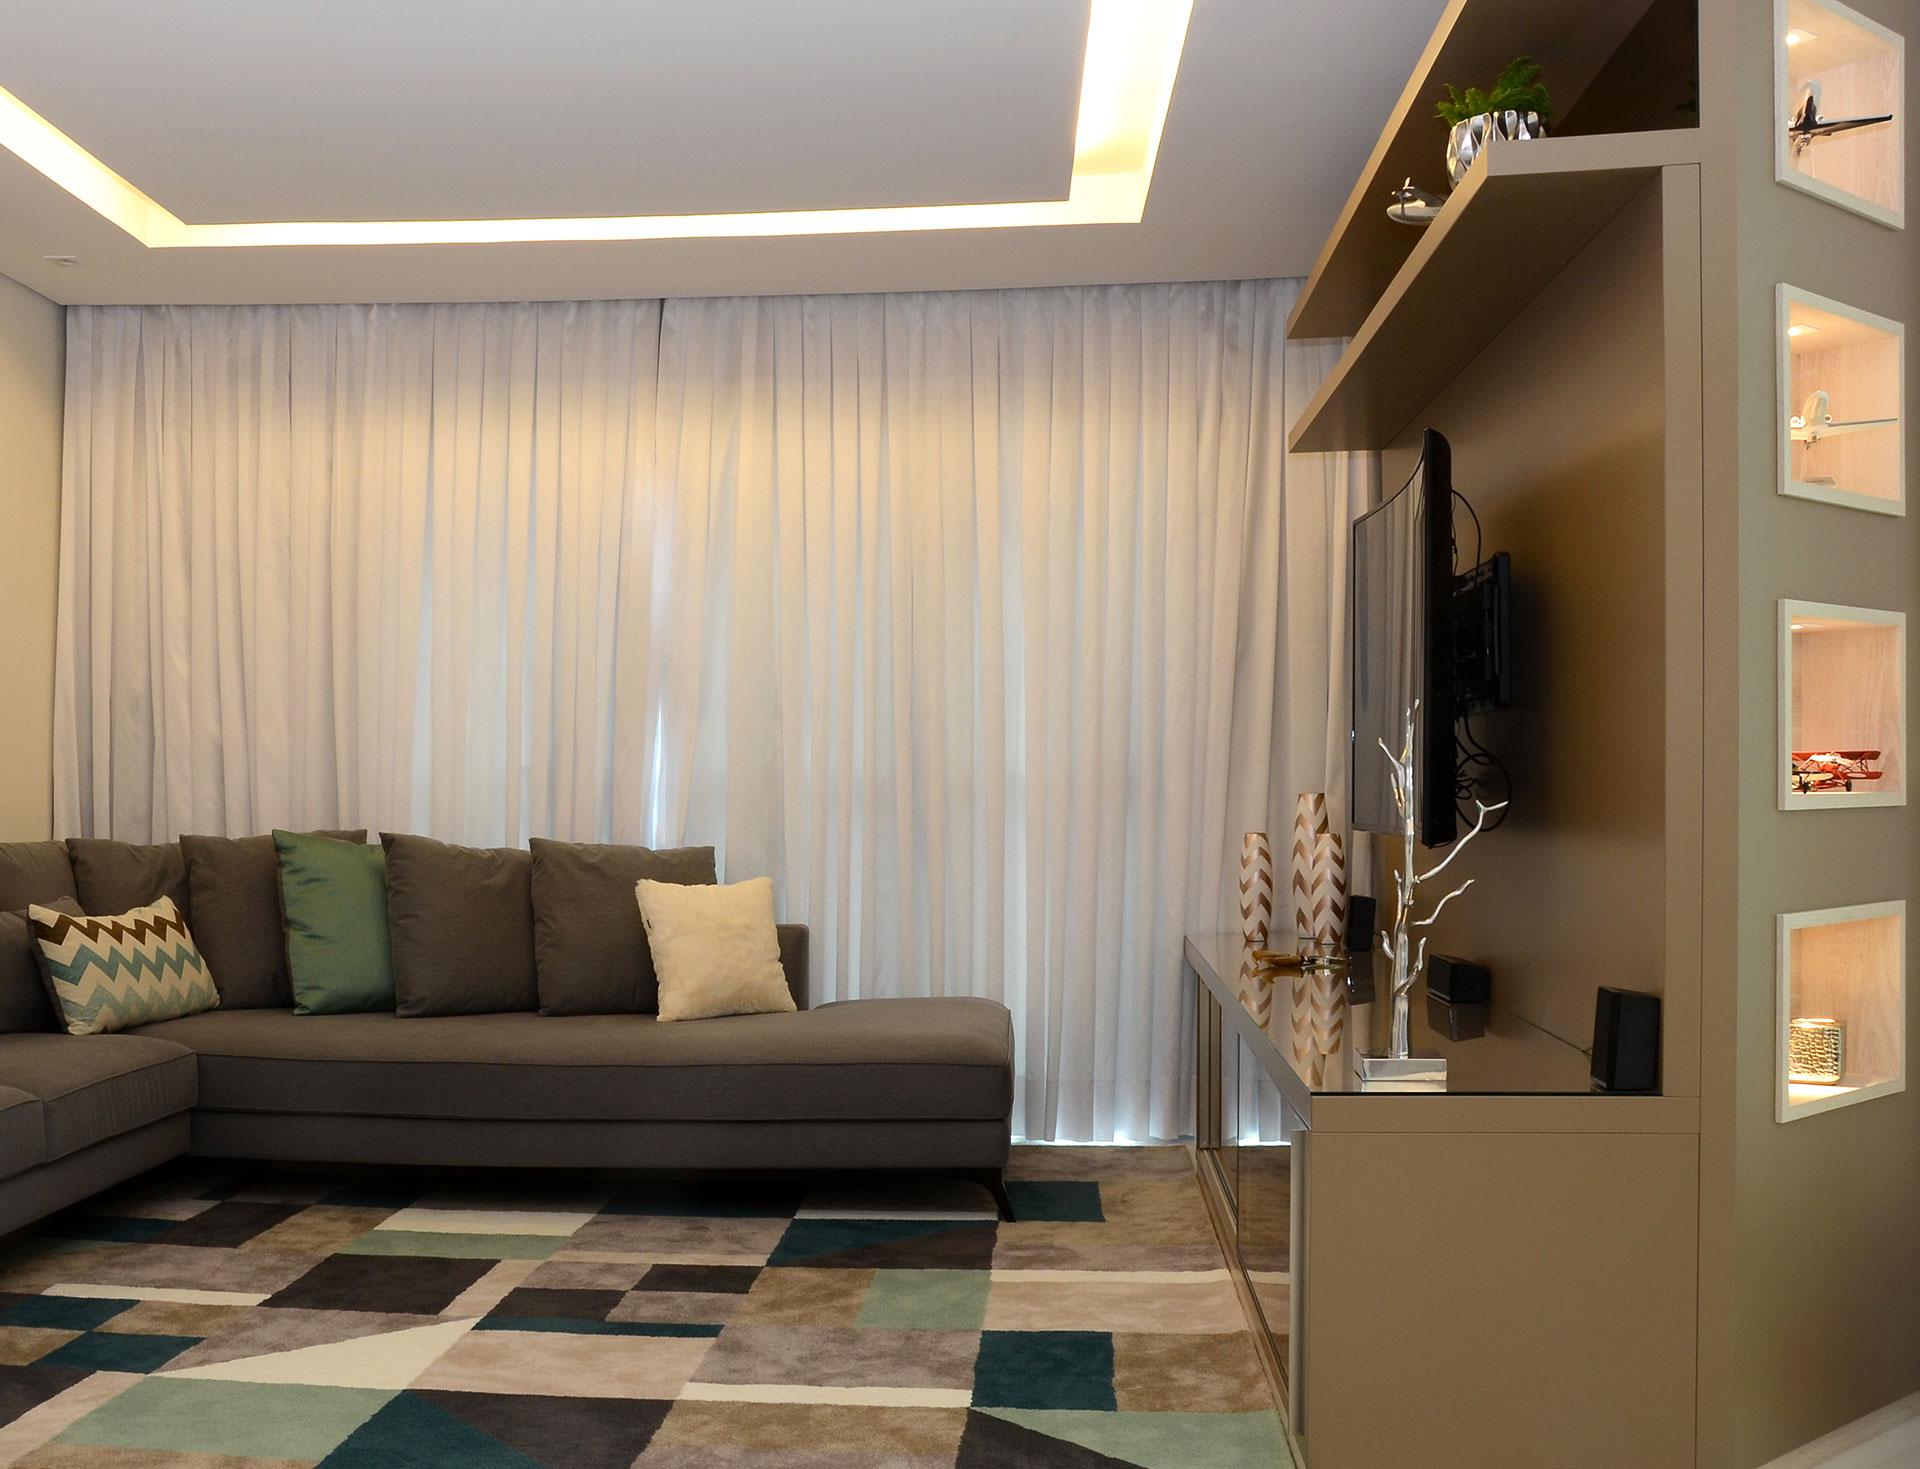 portfolio-cynthia-rolnik-apartamento1-05